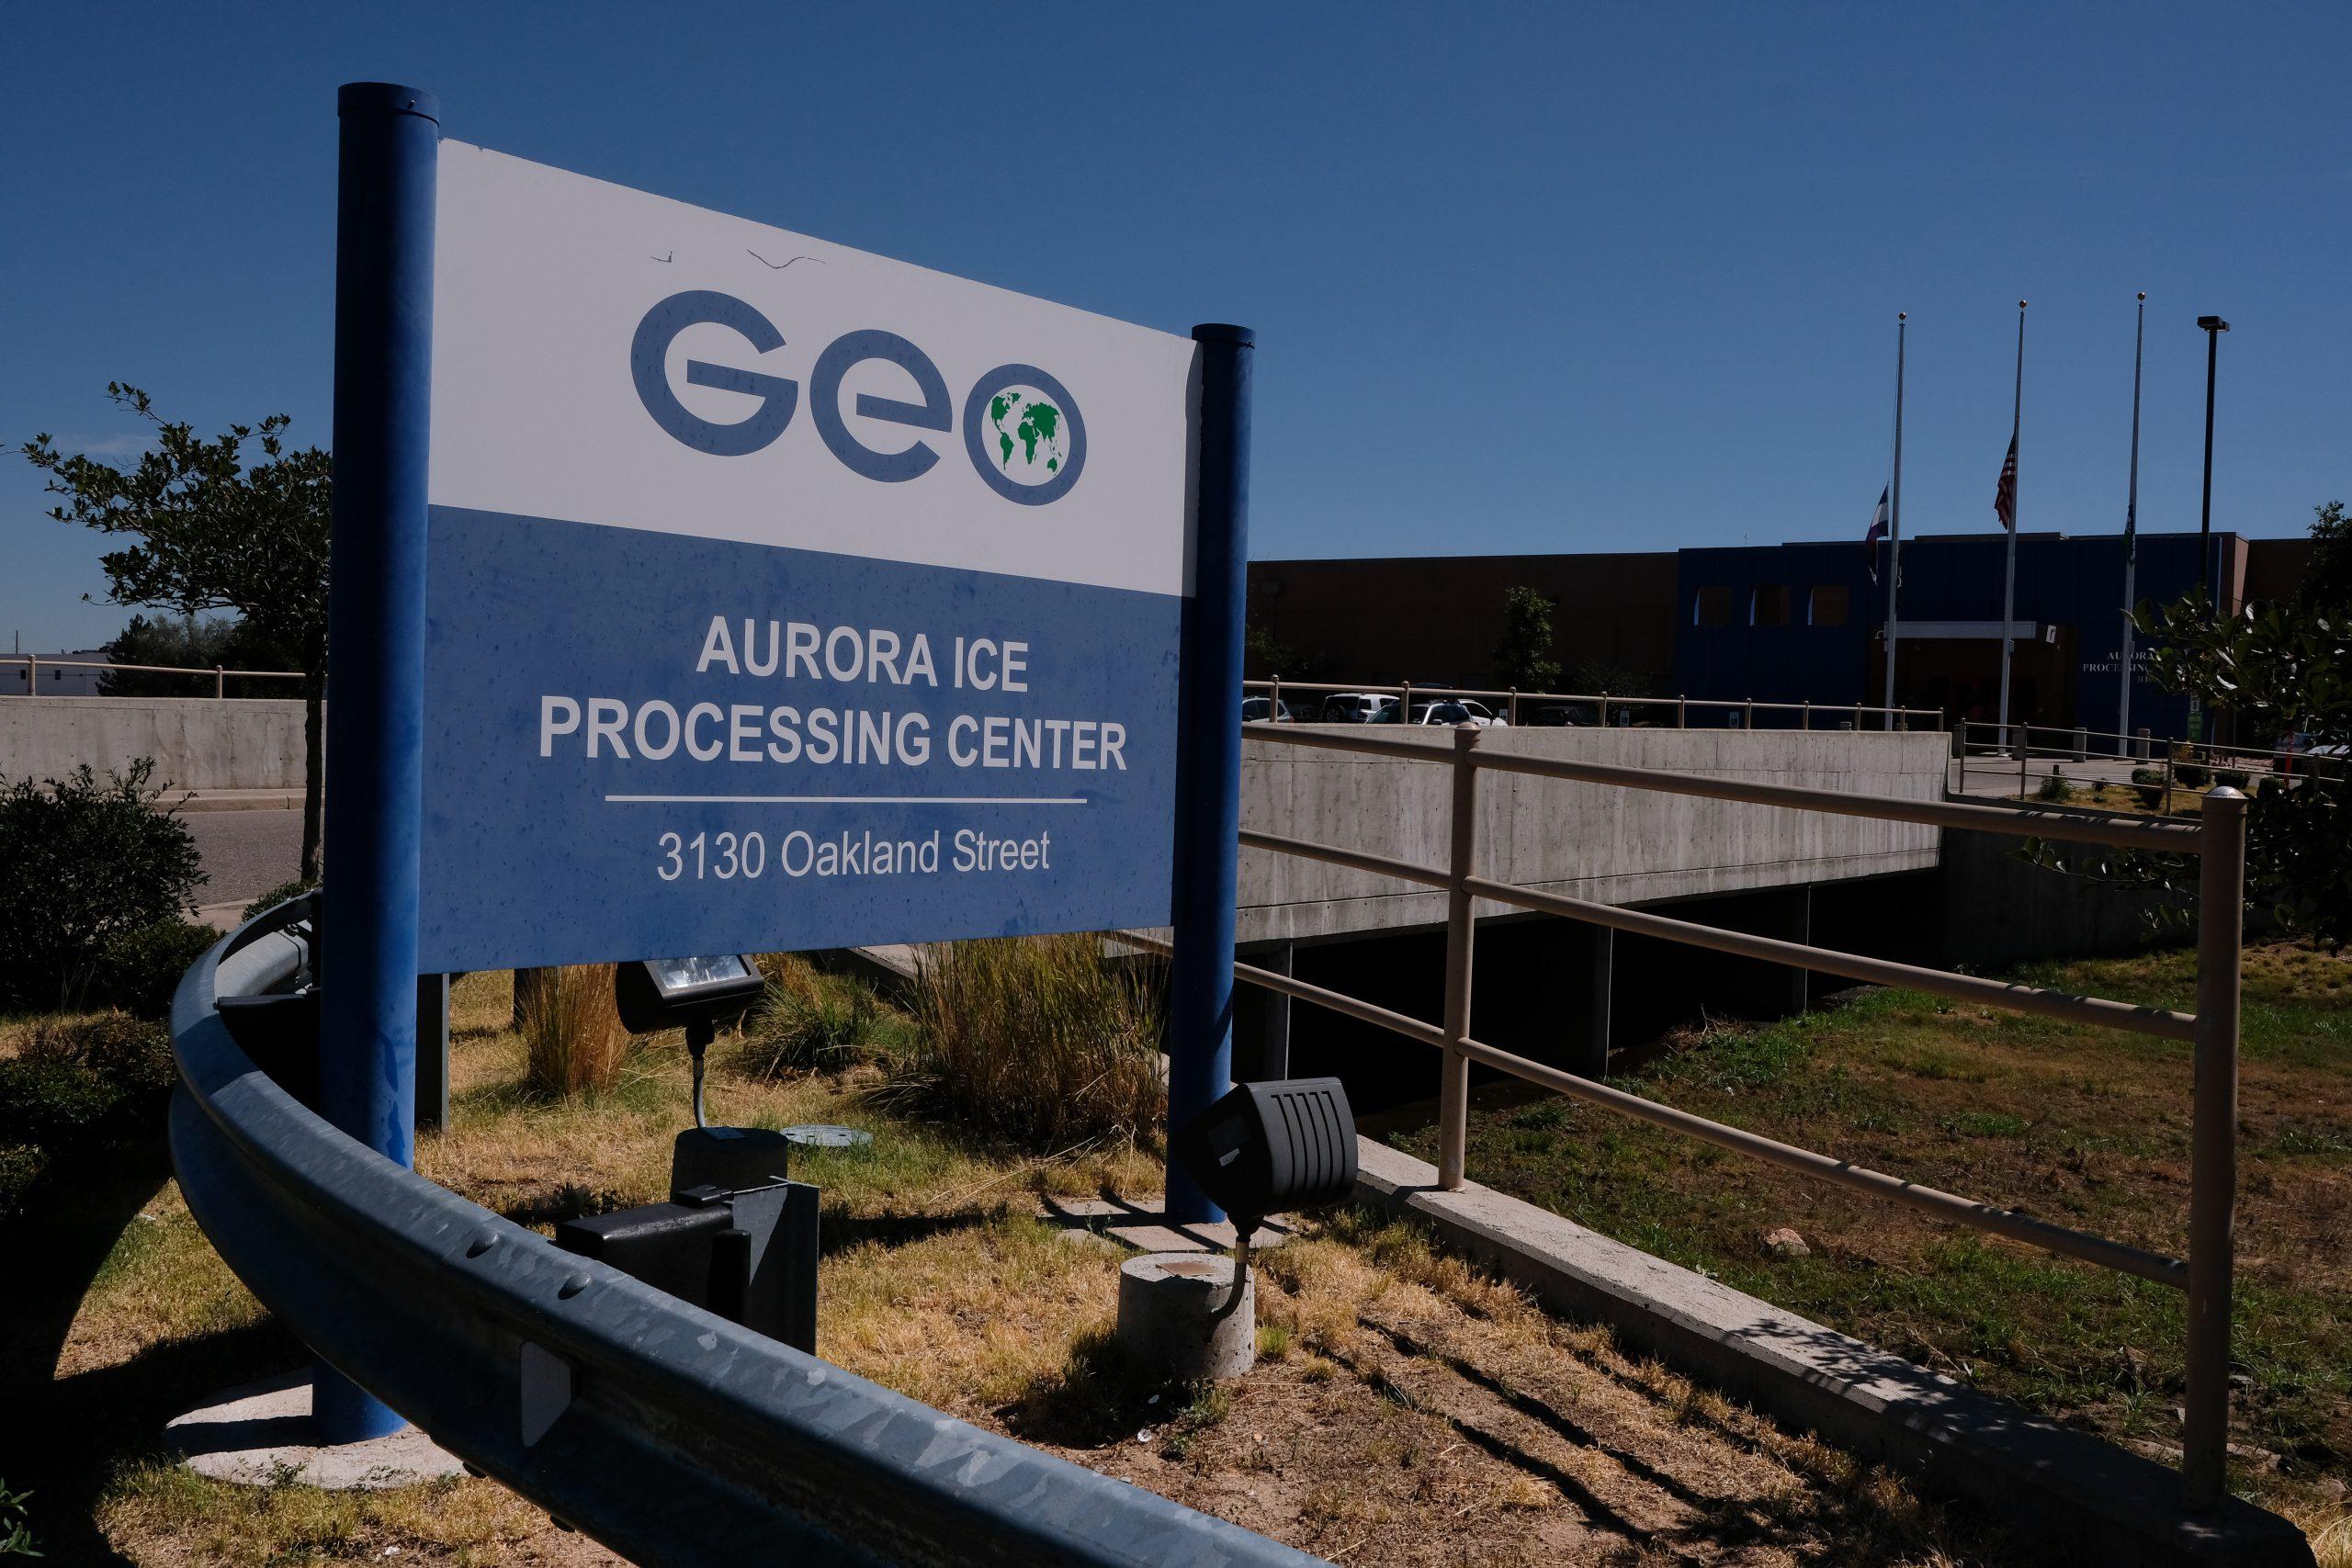 ICE Processing Center in Aurora, CO